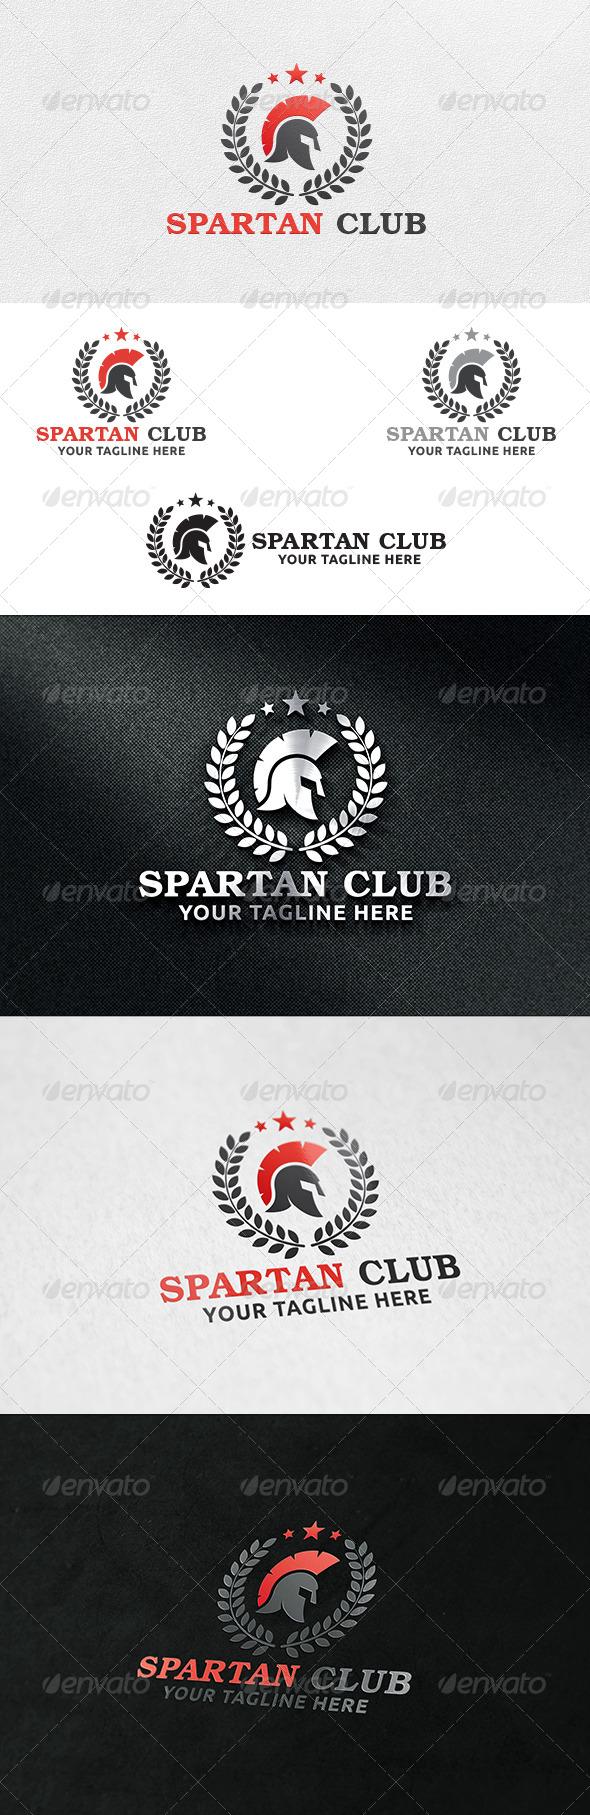 Spartan Club - Logo Template - Crests Logo Templates